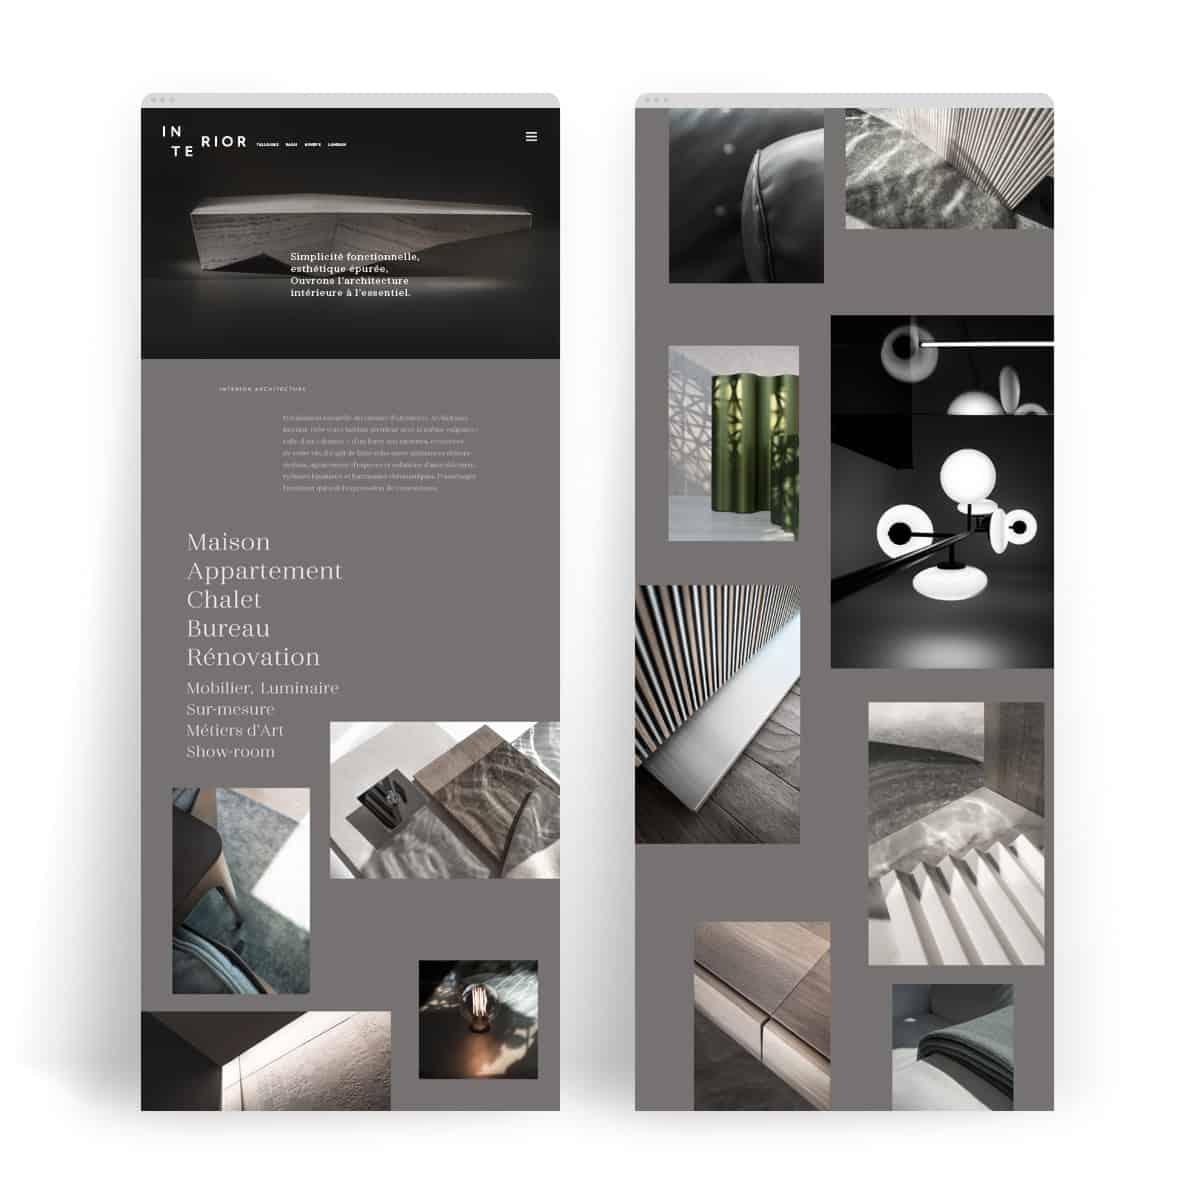 Création site internet, graphiste, webdesign. BLUE1310 agence de communication web marketing digital à Annecy